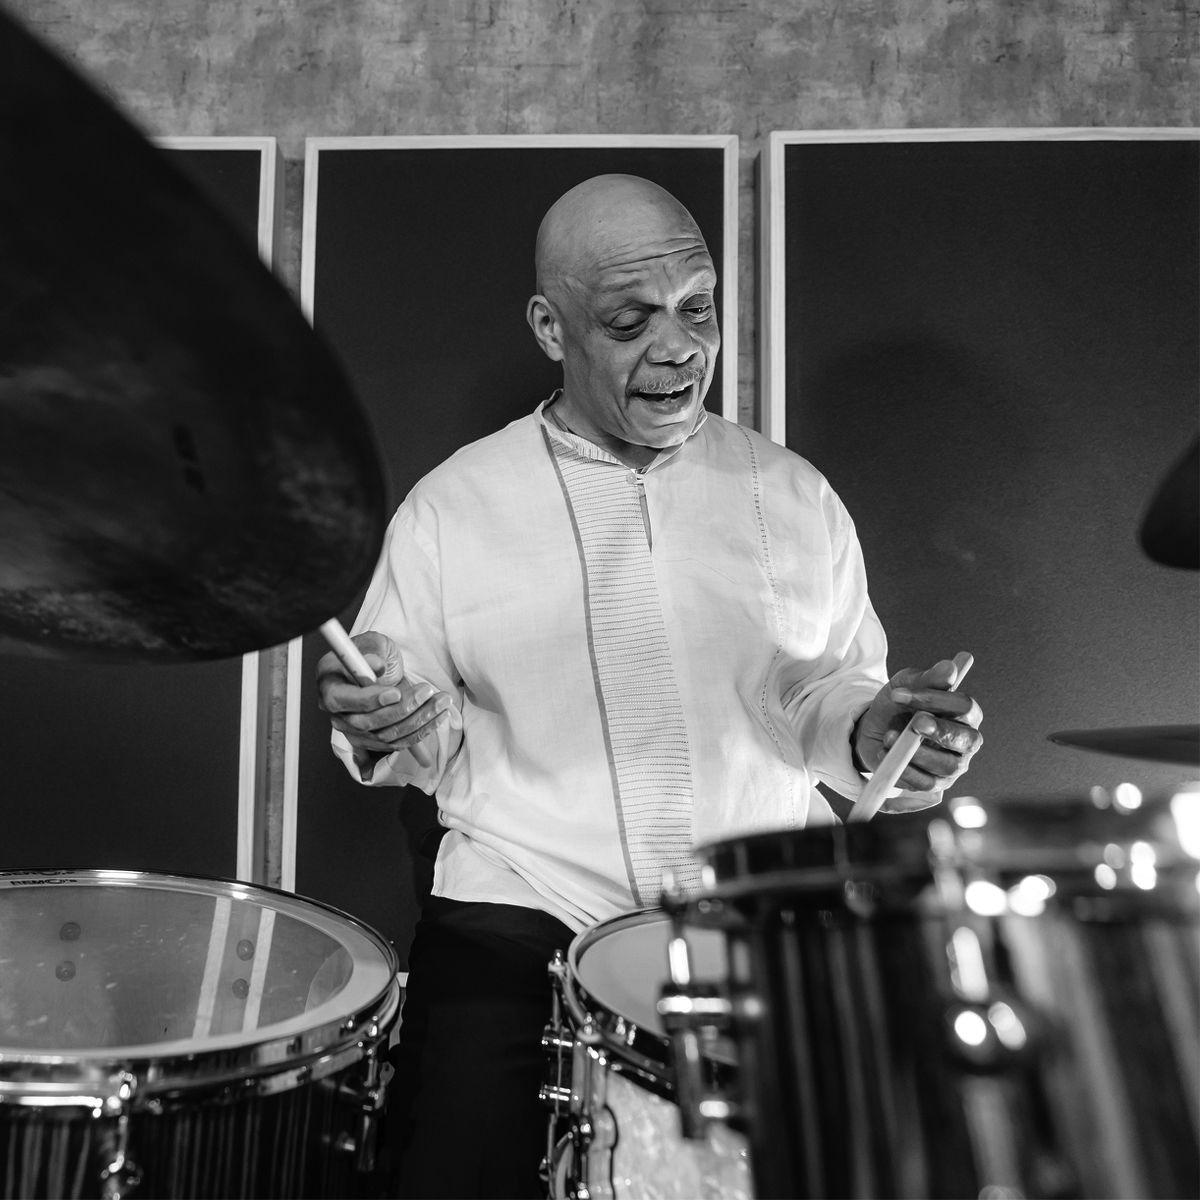 Darryl Ervin - THE EDGE SINGAPORE